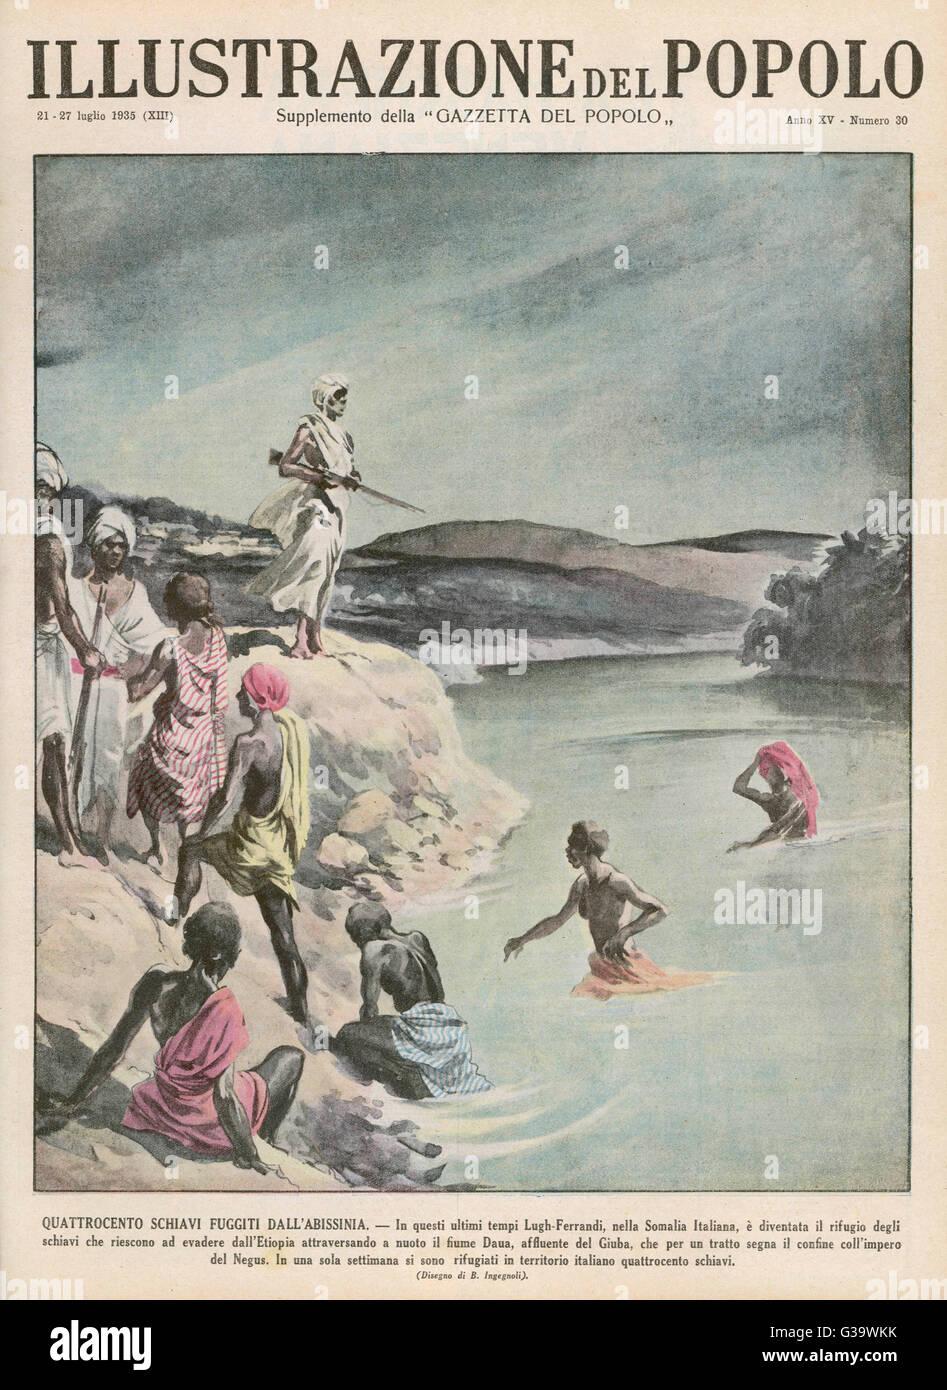 400 hundred slaves cross the  Dawa river from Ethiopia, seeking  refuge in Italian Somaliland        Date: 1935 - Stock Image